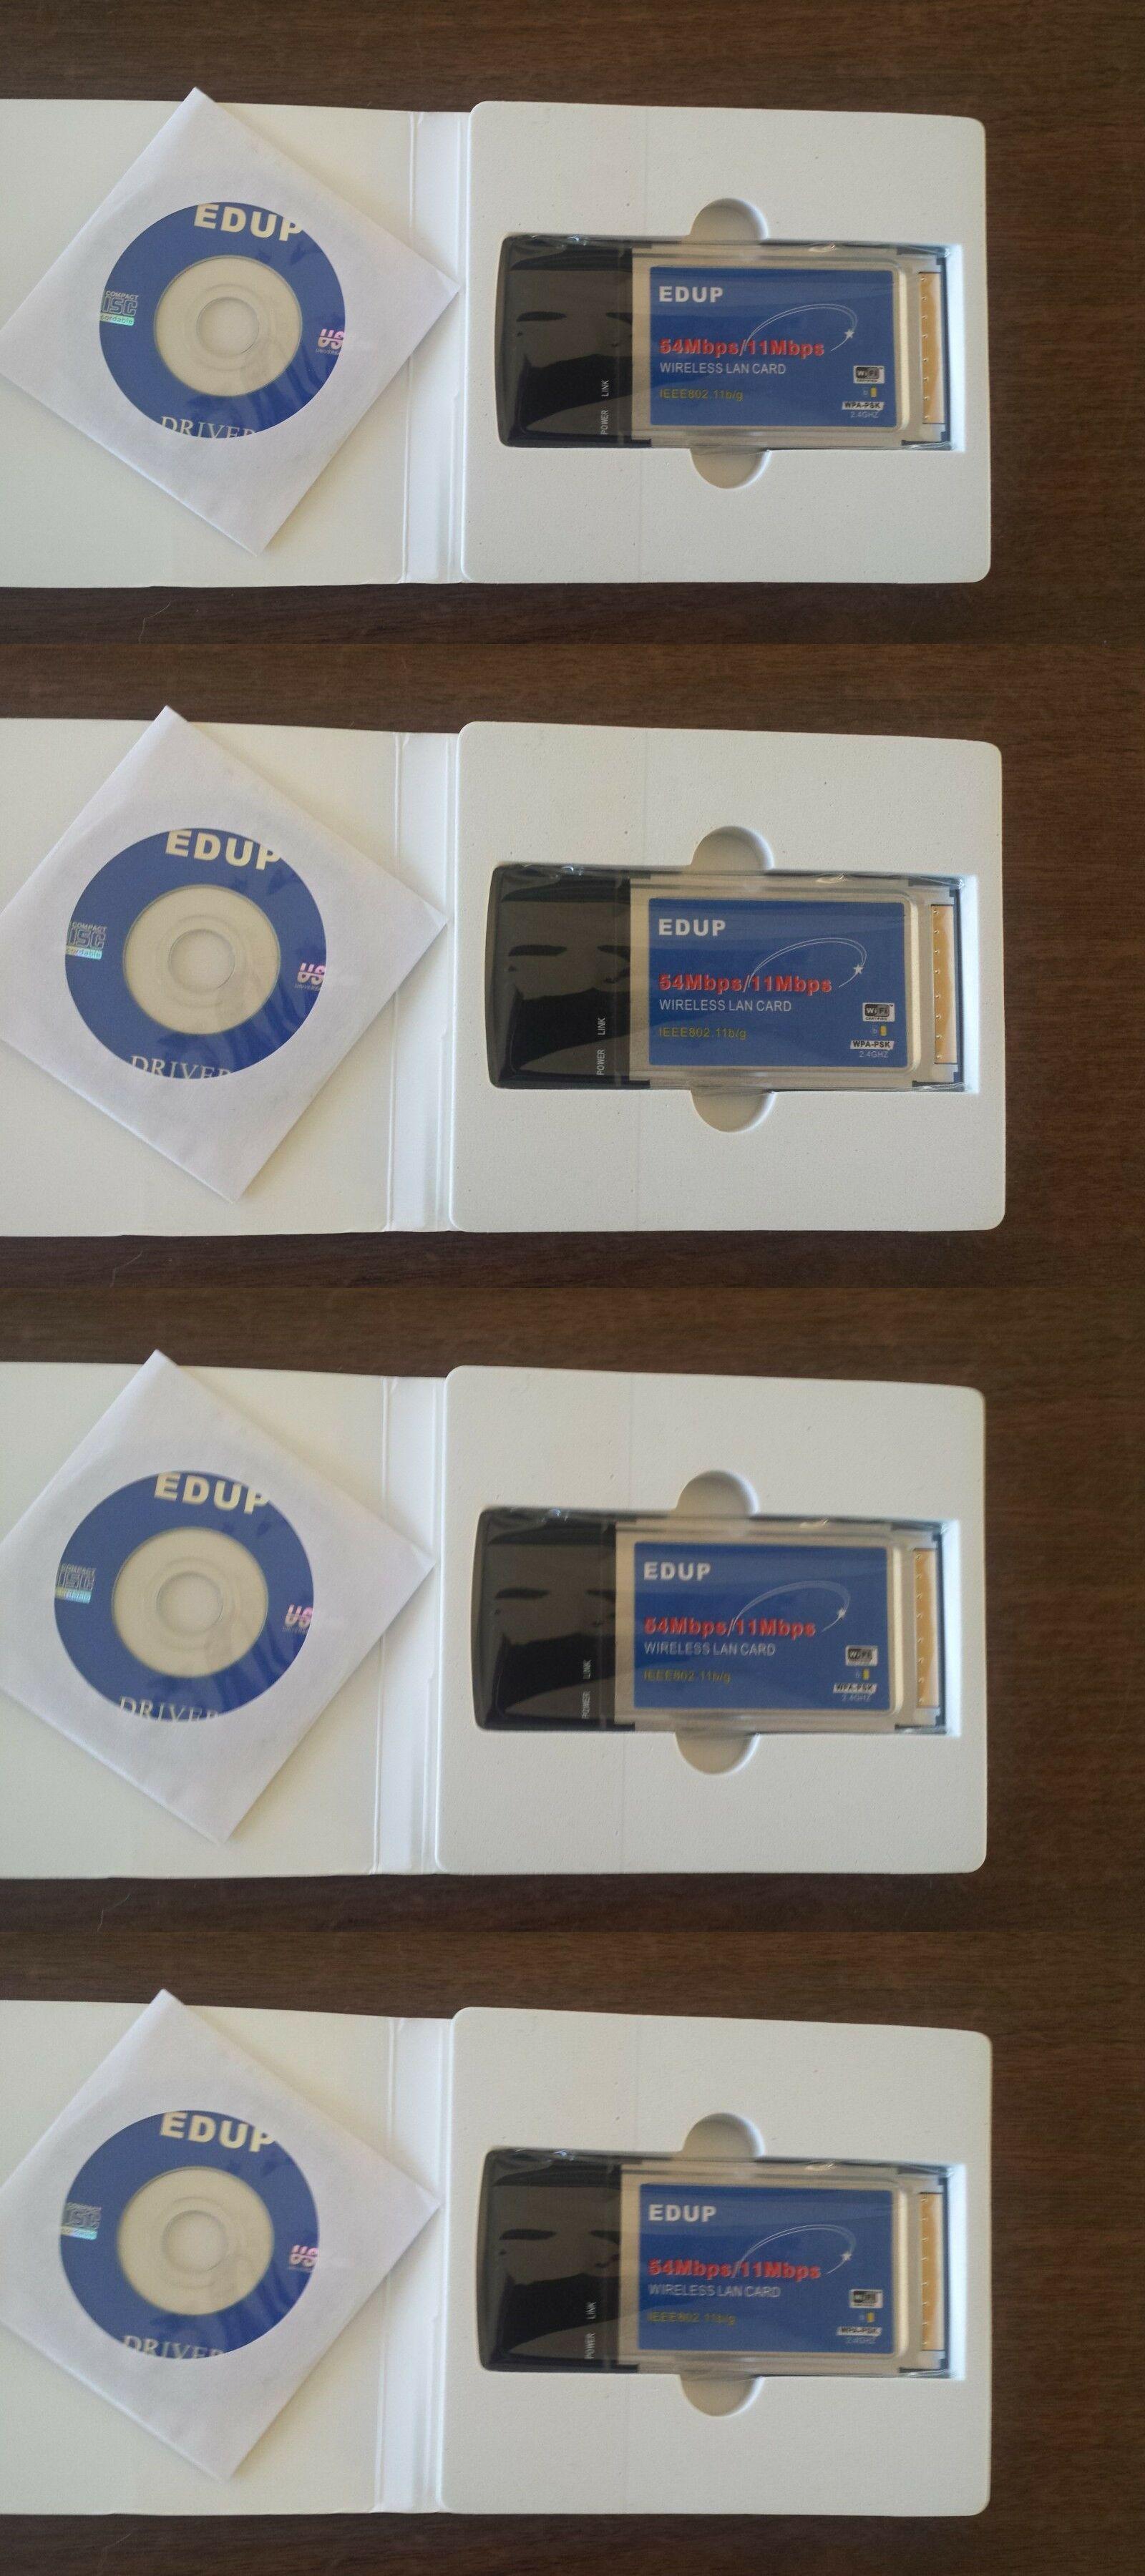 EDUP 11MBPS WIRELESS CARDBUS PC CARD WINDOWS 7 DRIVER DOWNLOAD